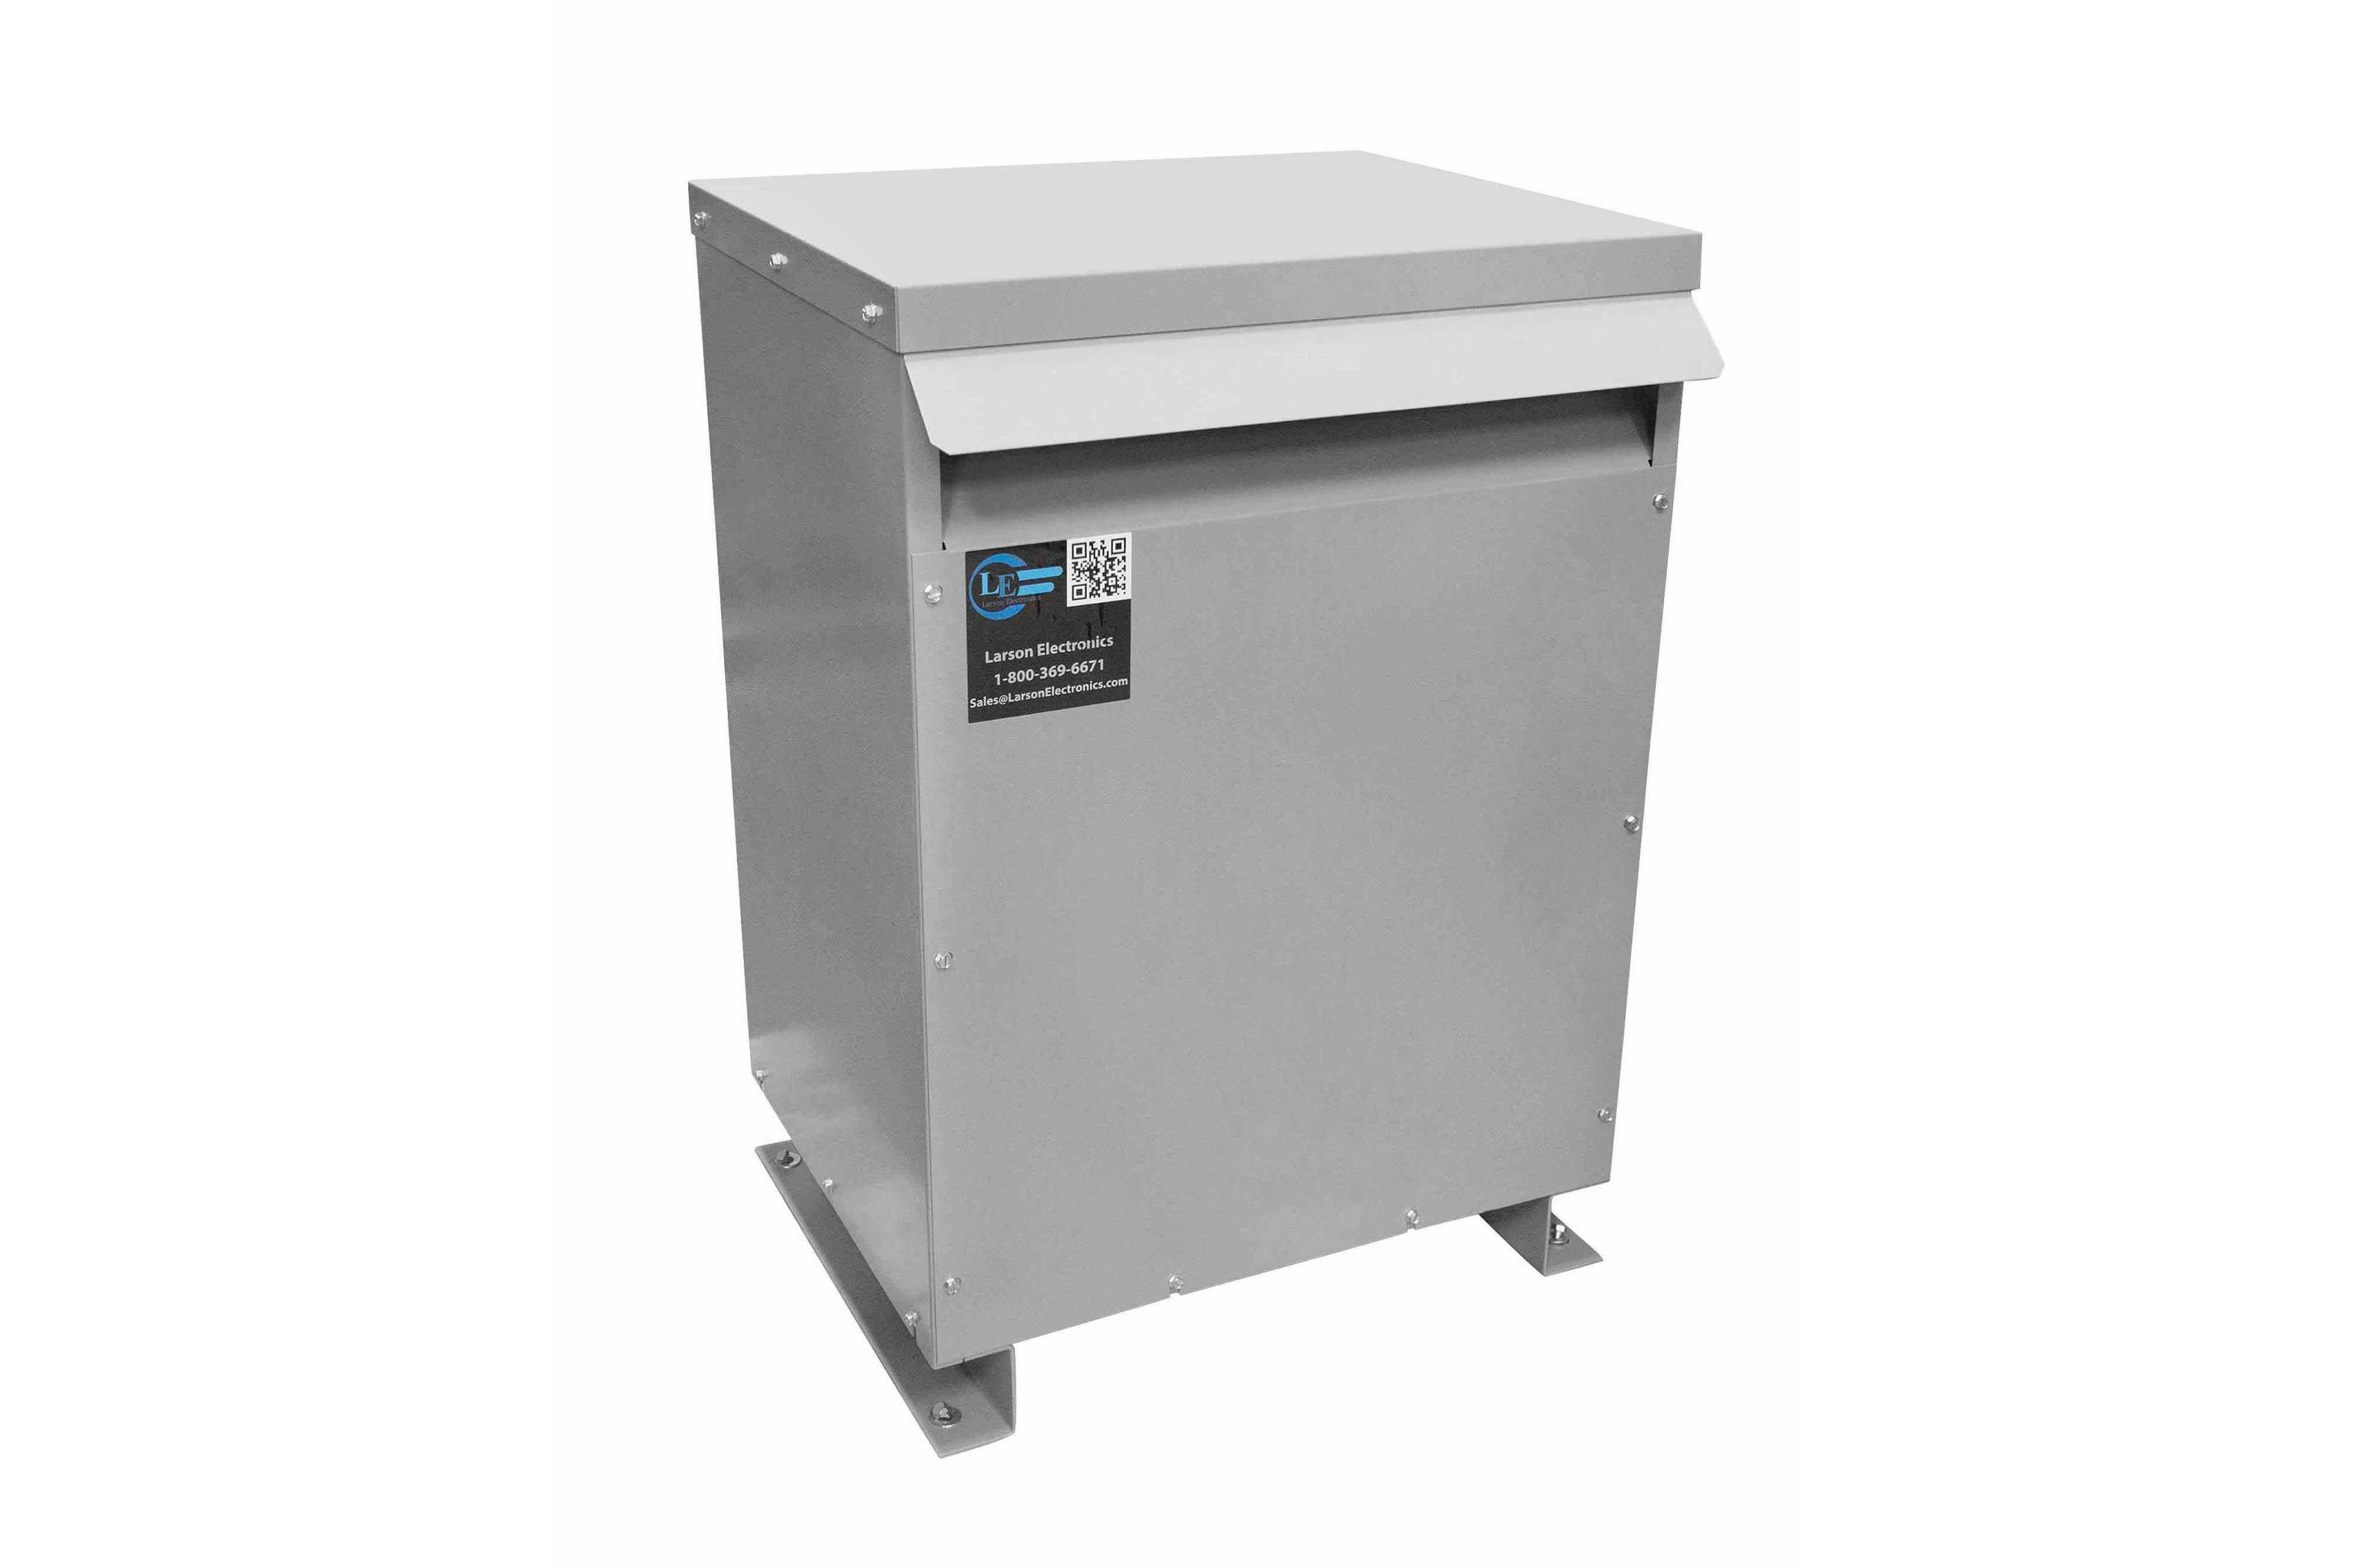 18 kVA 3PH Isolation Transformer, 415V Wye Primary, 240V Delta Secondary, N3R, Ventilated, 60 Hz